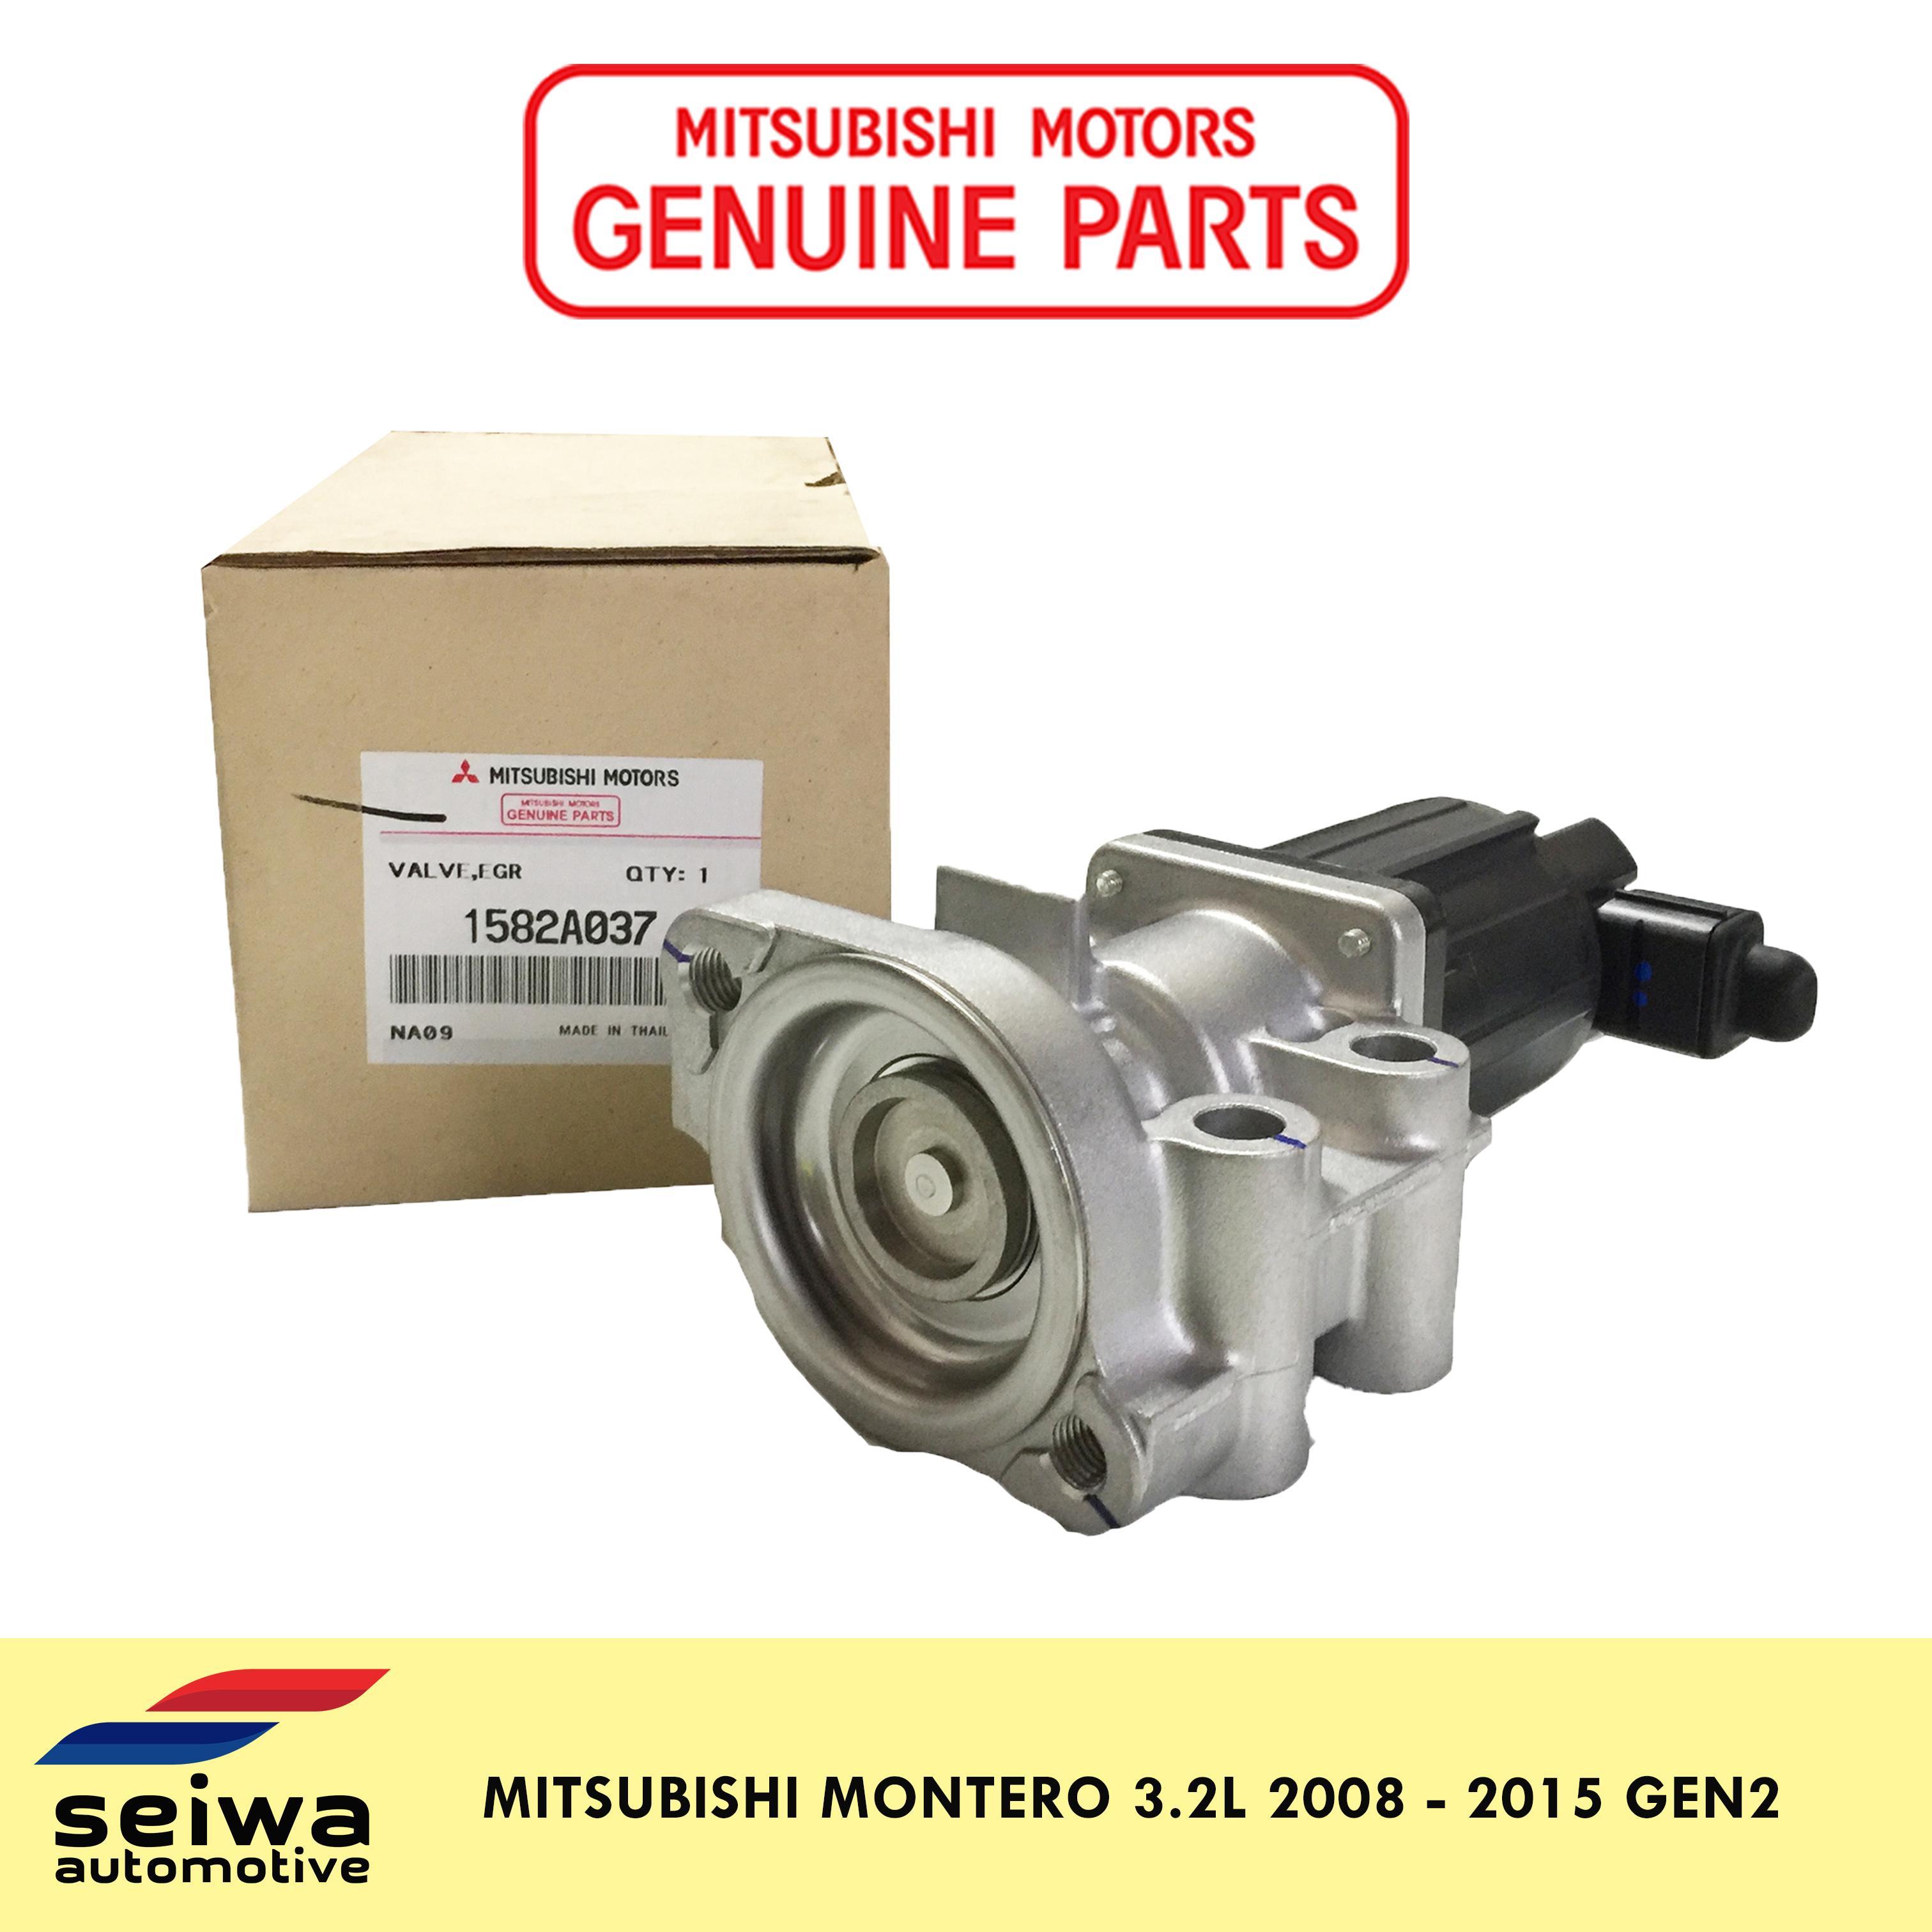 Mitsubishi Montero GEN2 3 2L 2008-2015 EGR Valve - Genuine Mitsubishi Auto  Parts - 1582A037